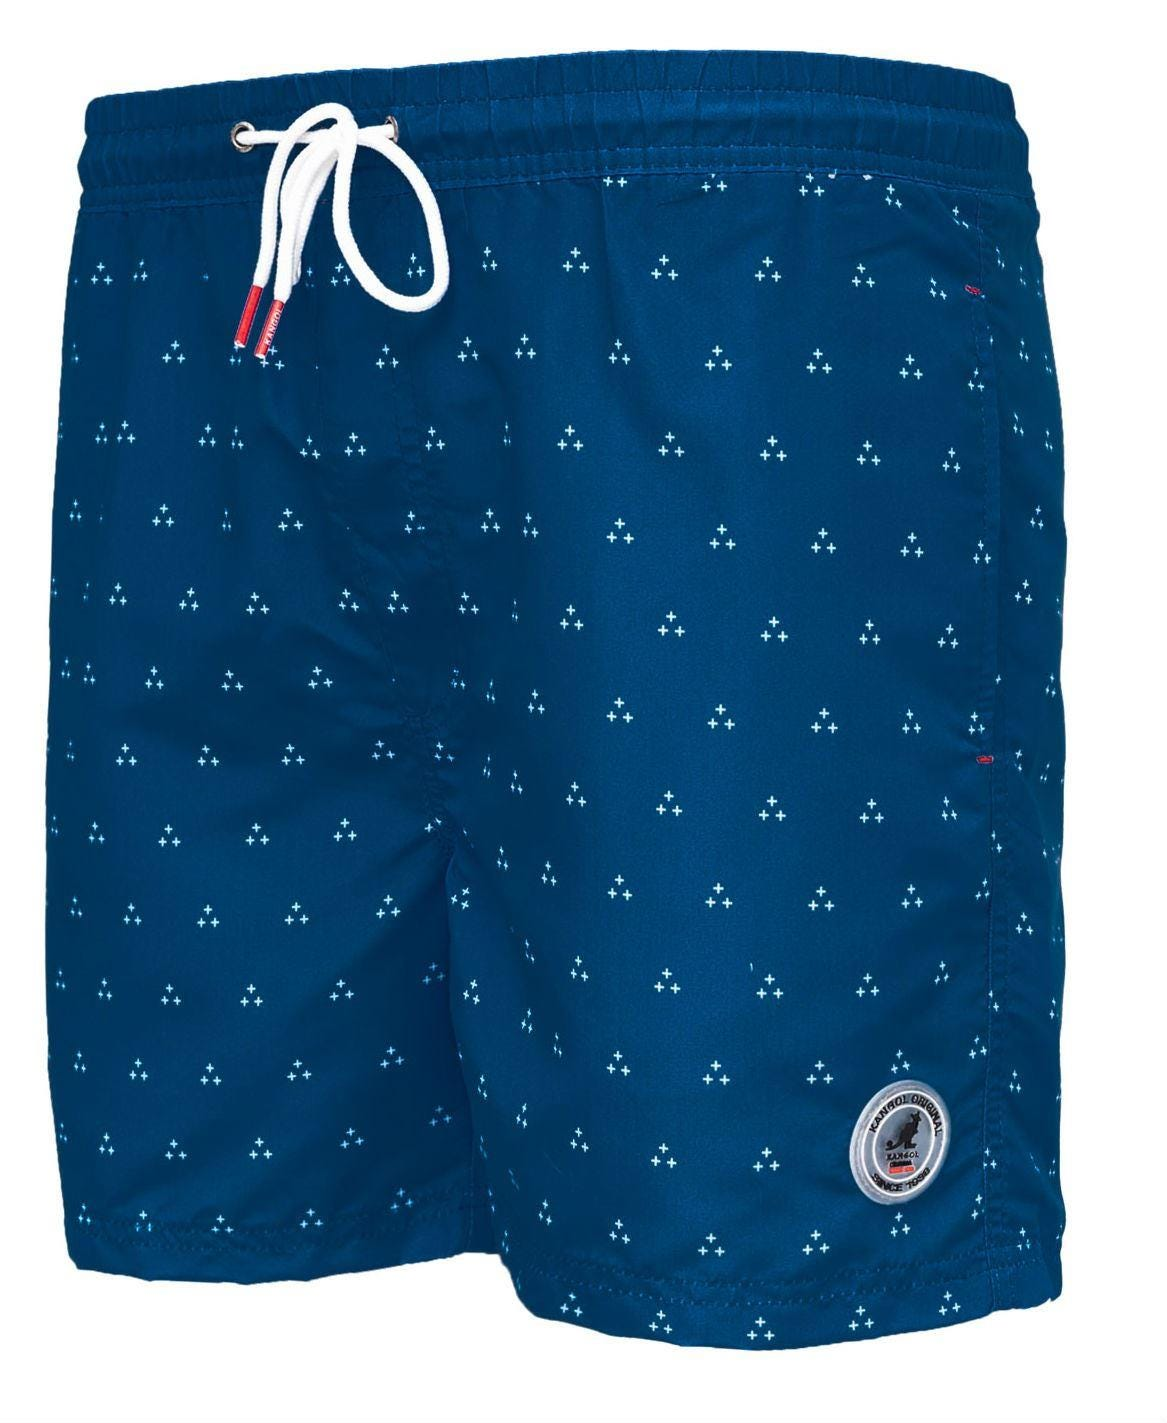 Kangol Cohen Swimming Shorts - Cobalt Navy Blue